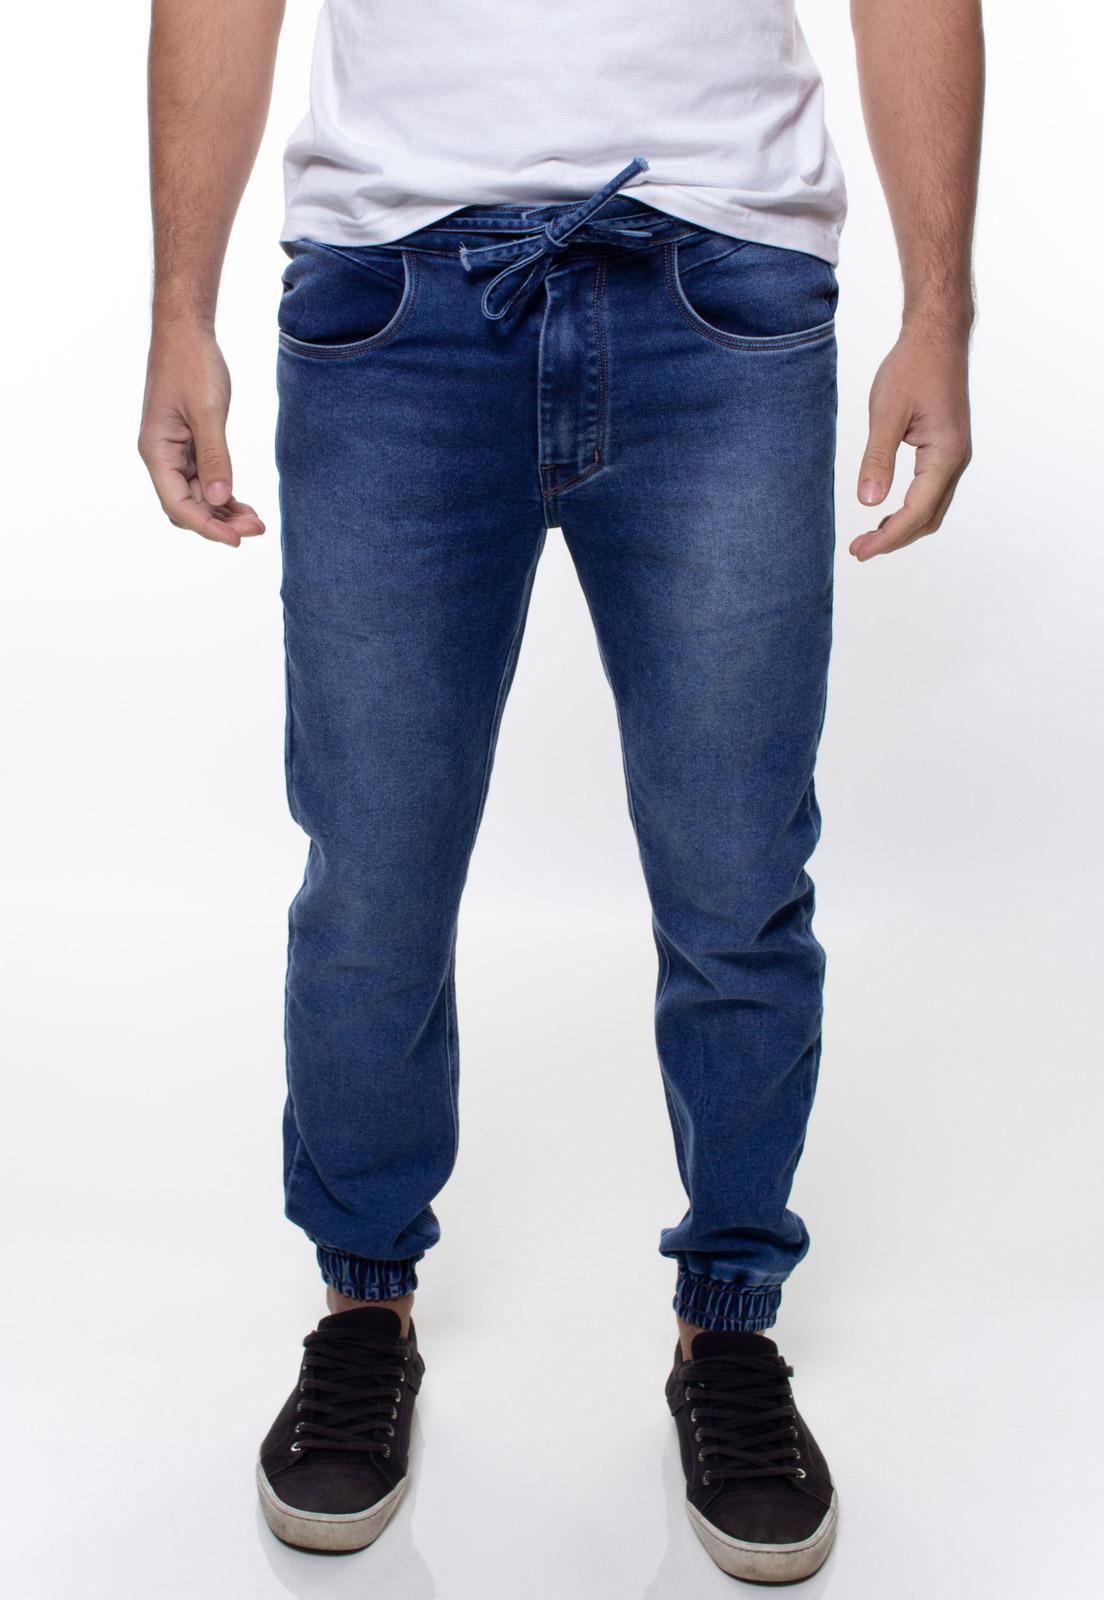 Calça Jogger Jeans Masculina Crocker - 48062  - CROCKER JEANS